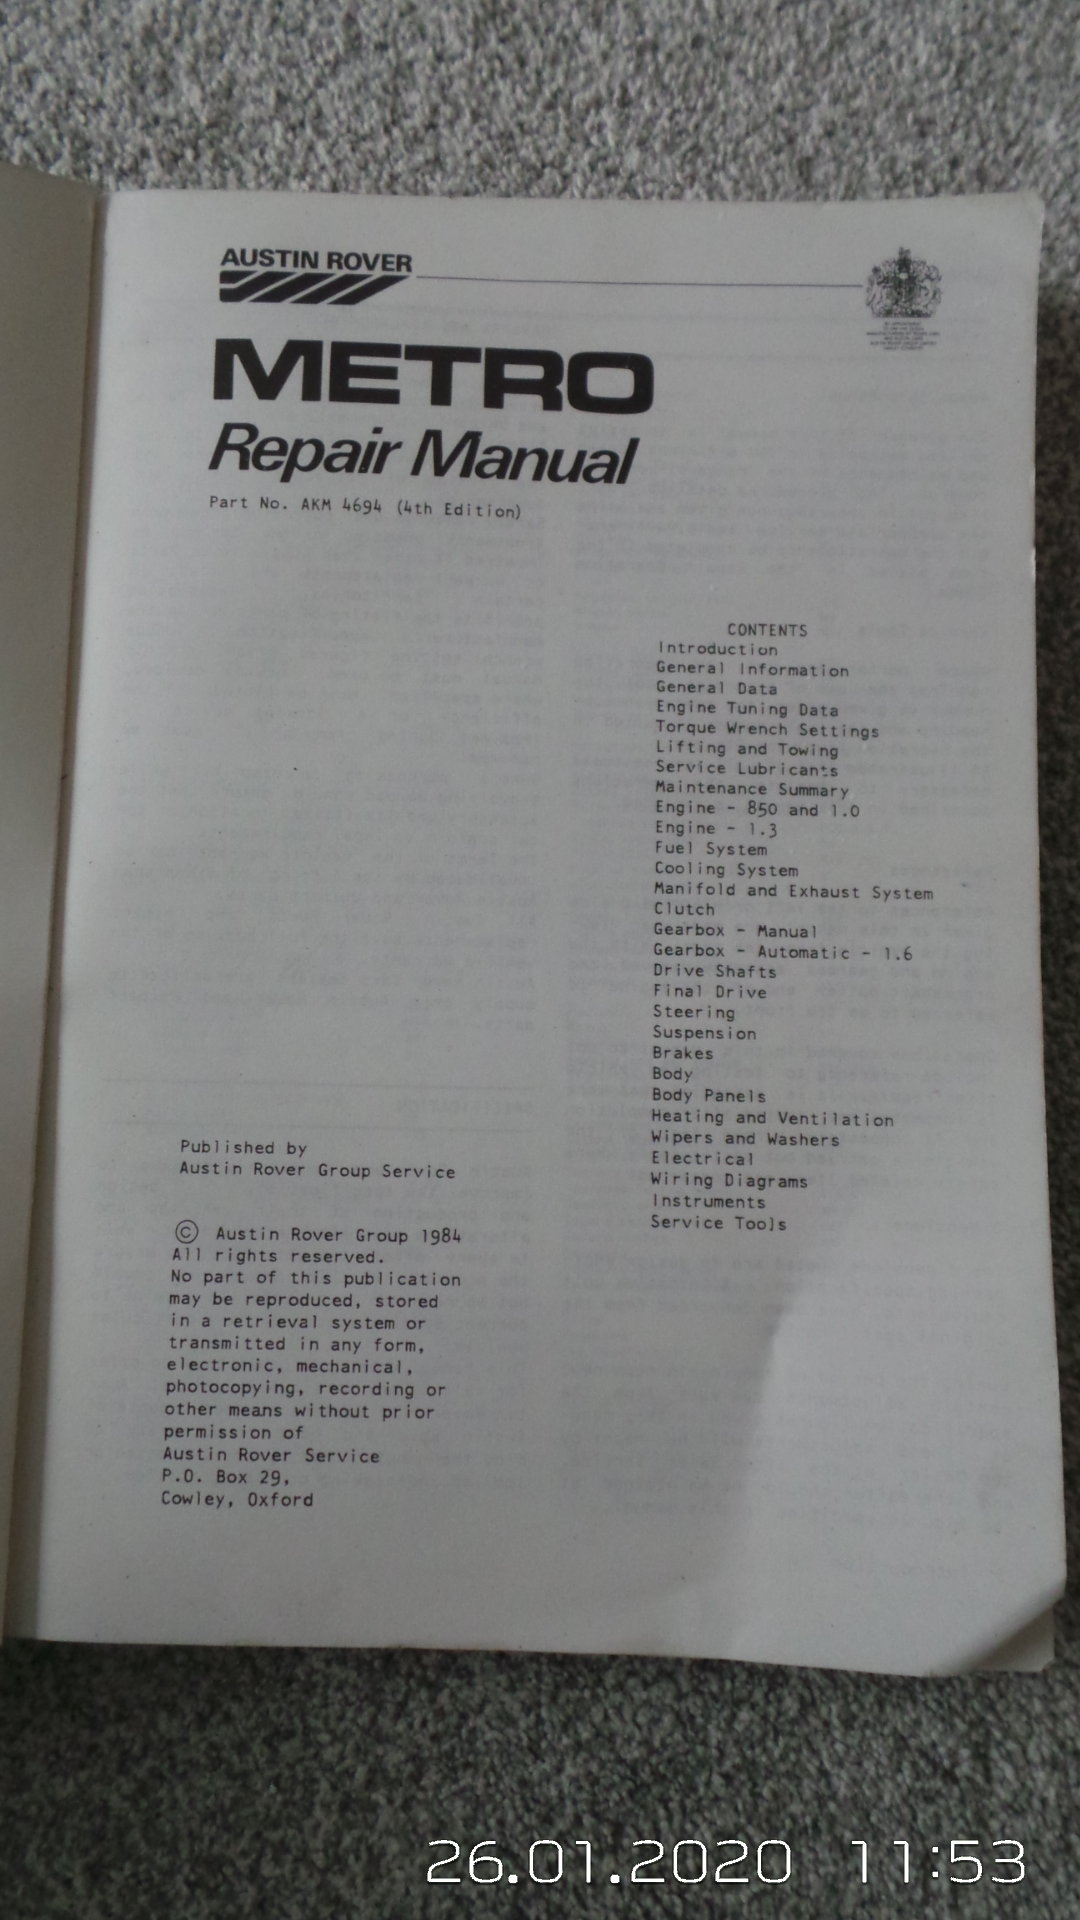 Original metro workshop manual SOLD (picture 2 of 3)